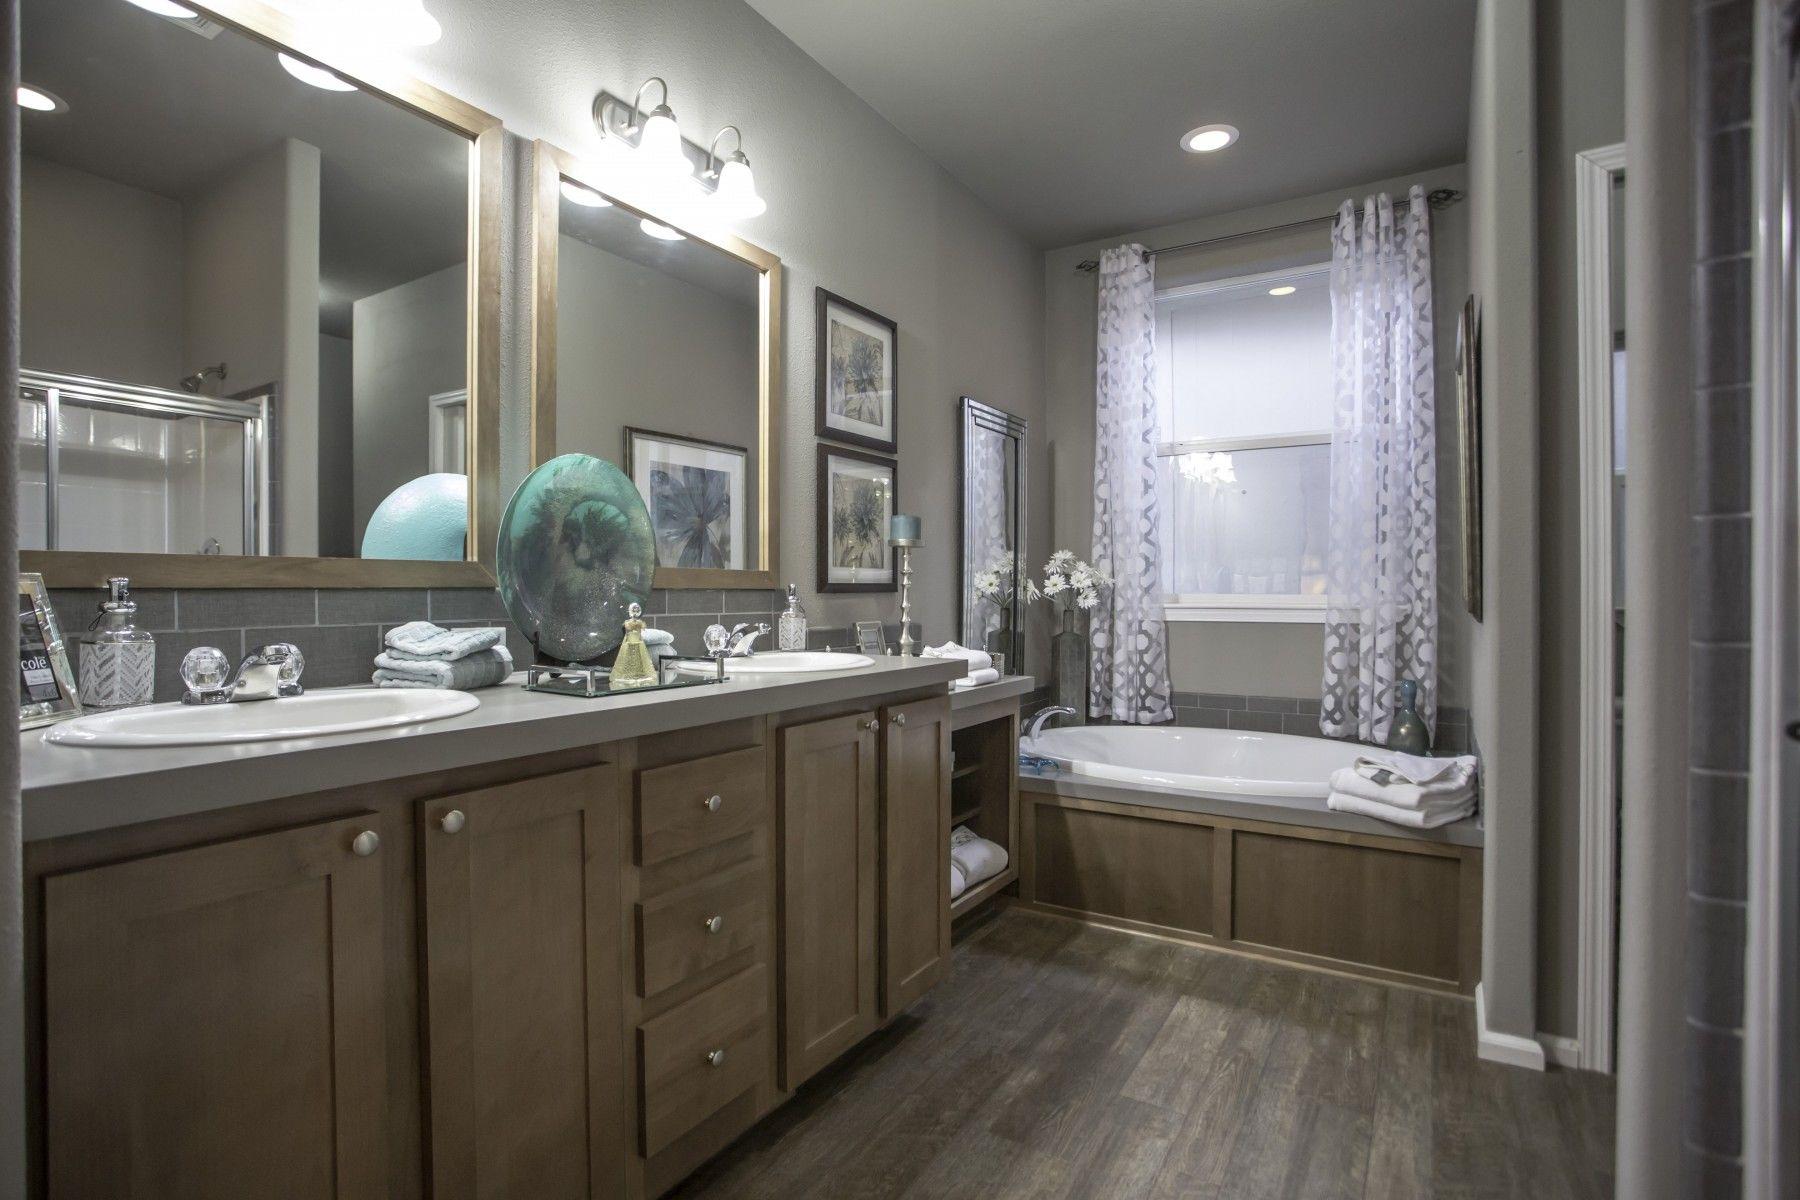 Customization Option for Bathroom of Your Manufactured ... on Model Bathroom Ideas  id=30361